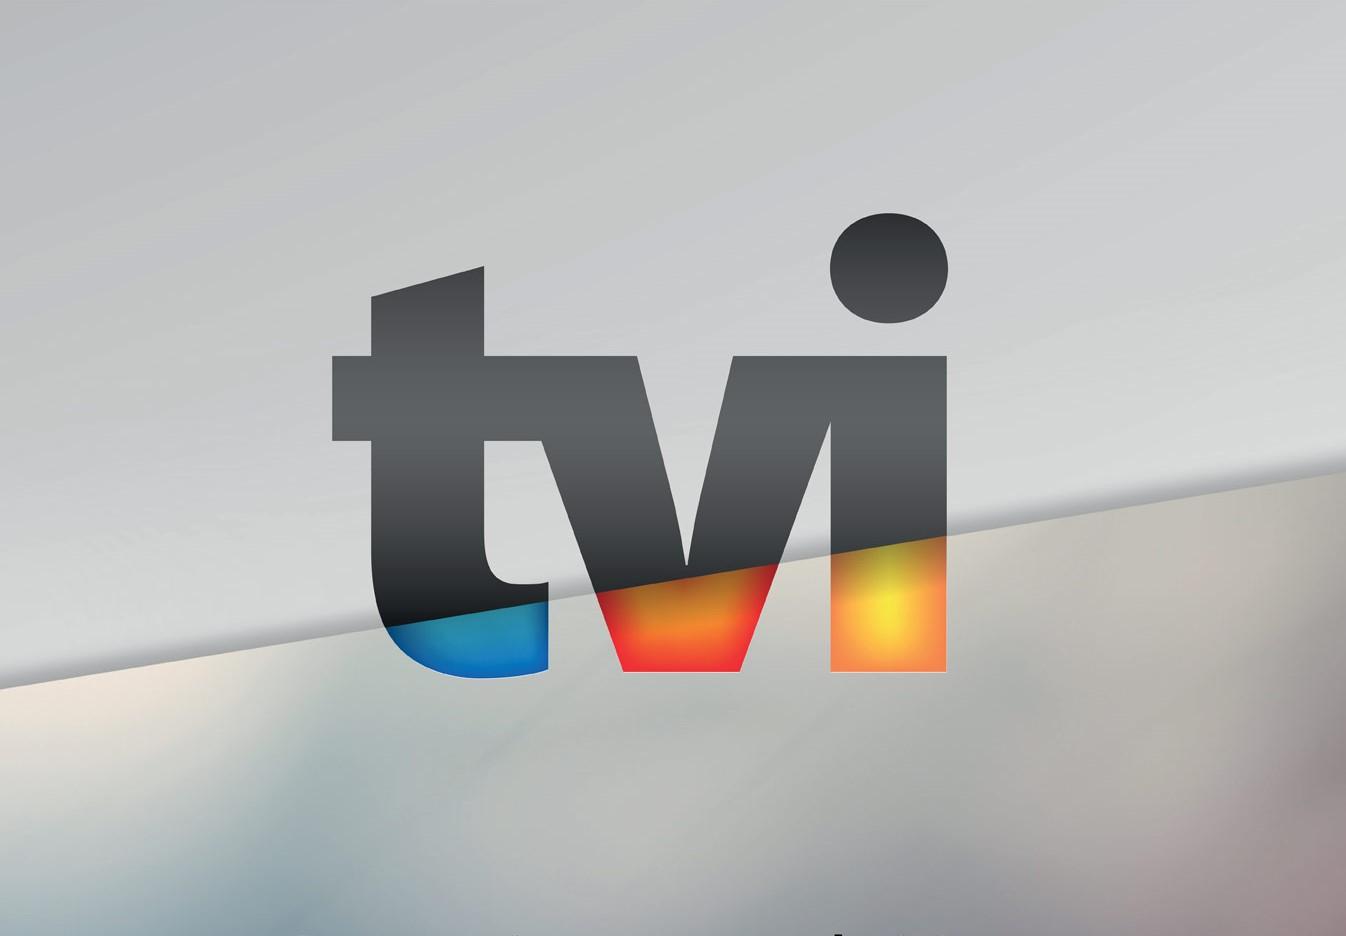 tvi logotipo